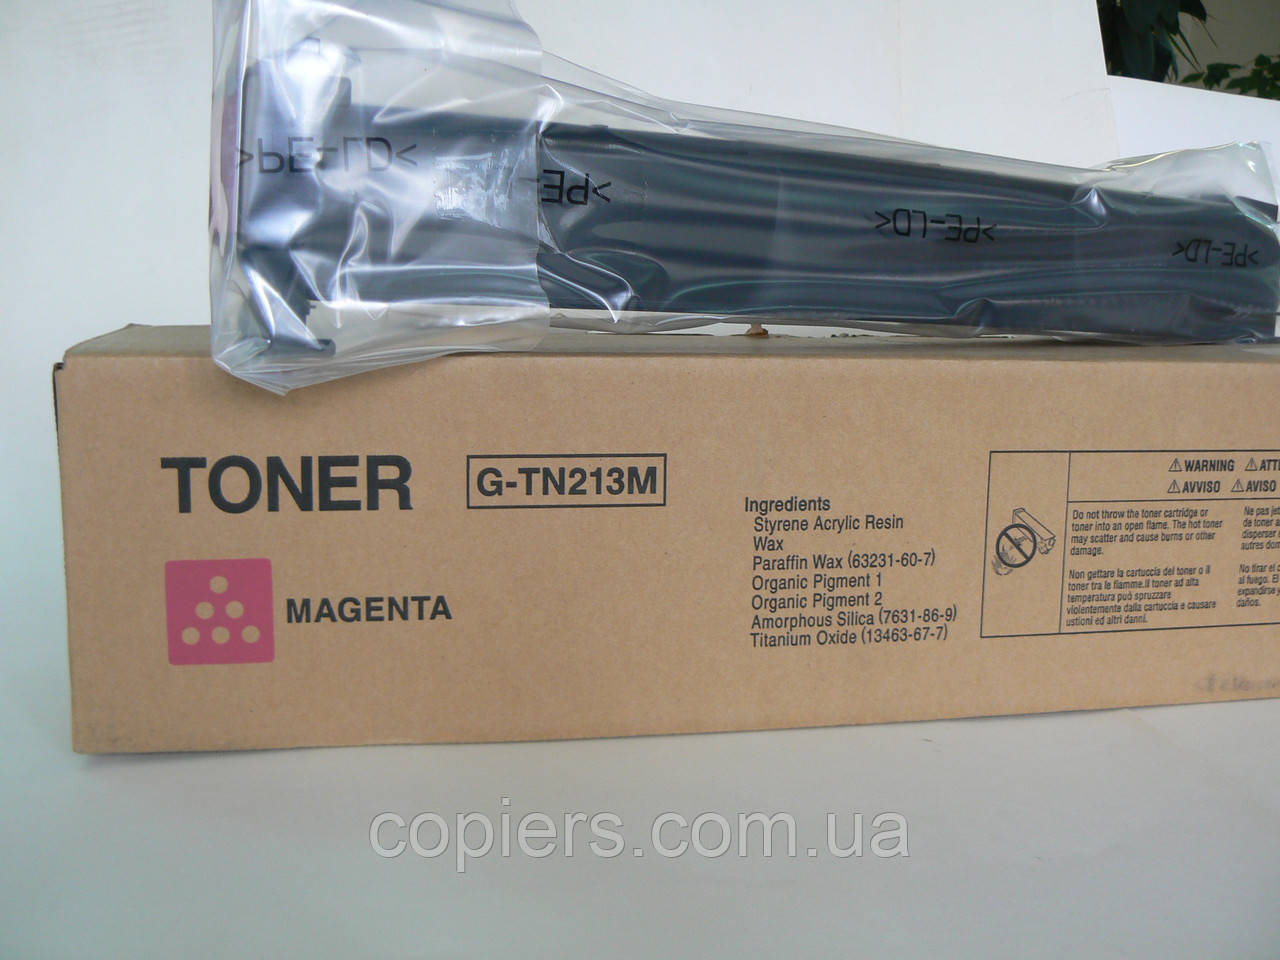 Toner TN213 Magenta bizhub C253/C203,364, оригинальный OCE